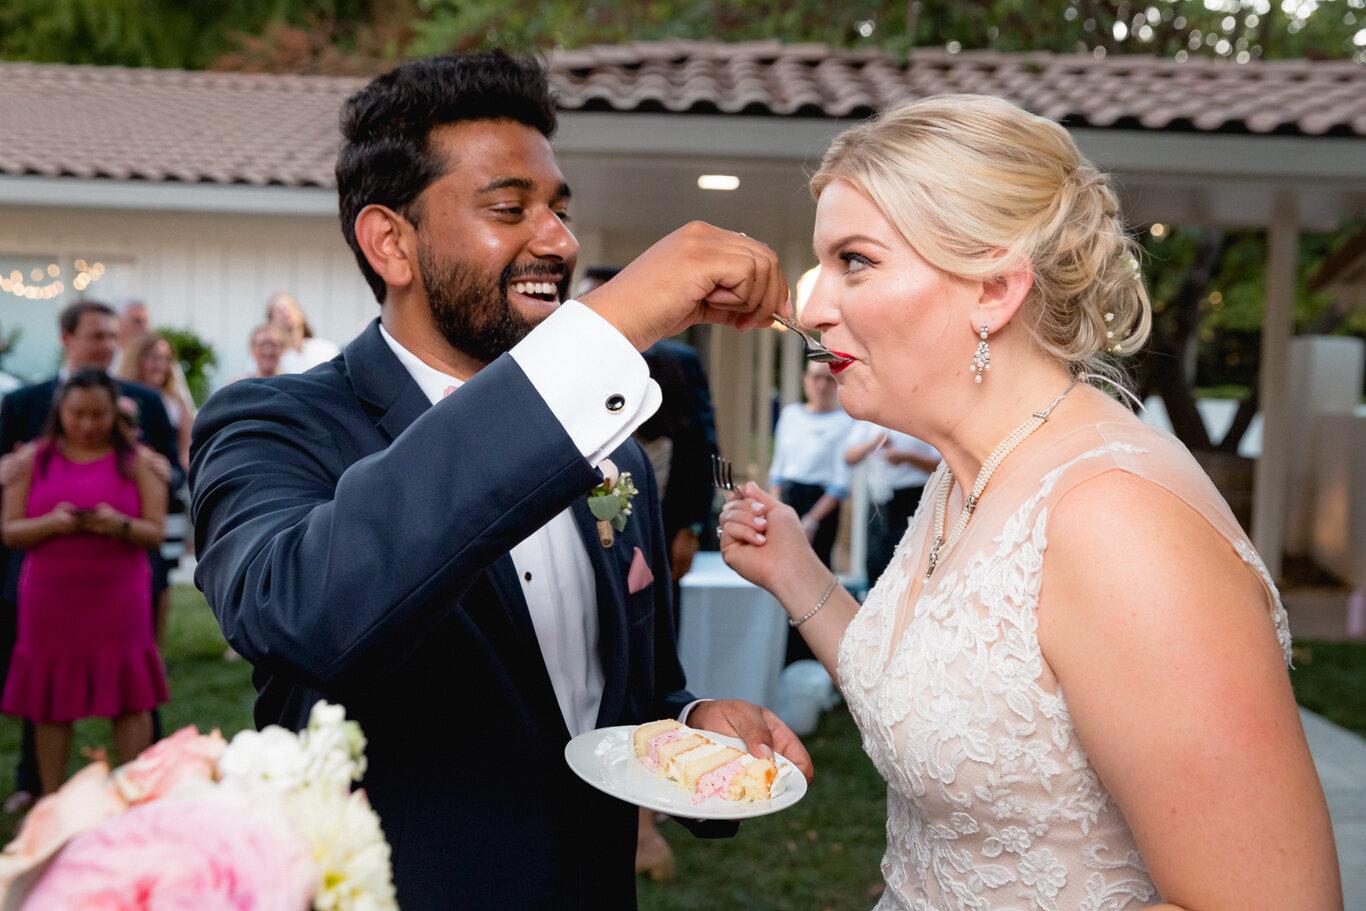 2019.08.24_Emily-Ashir-Wedding-at-the-Maples-6330.jpg